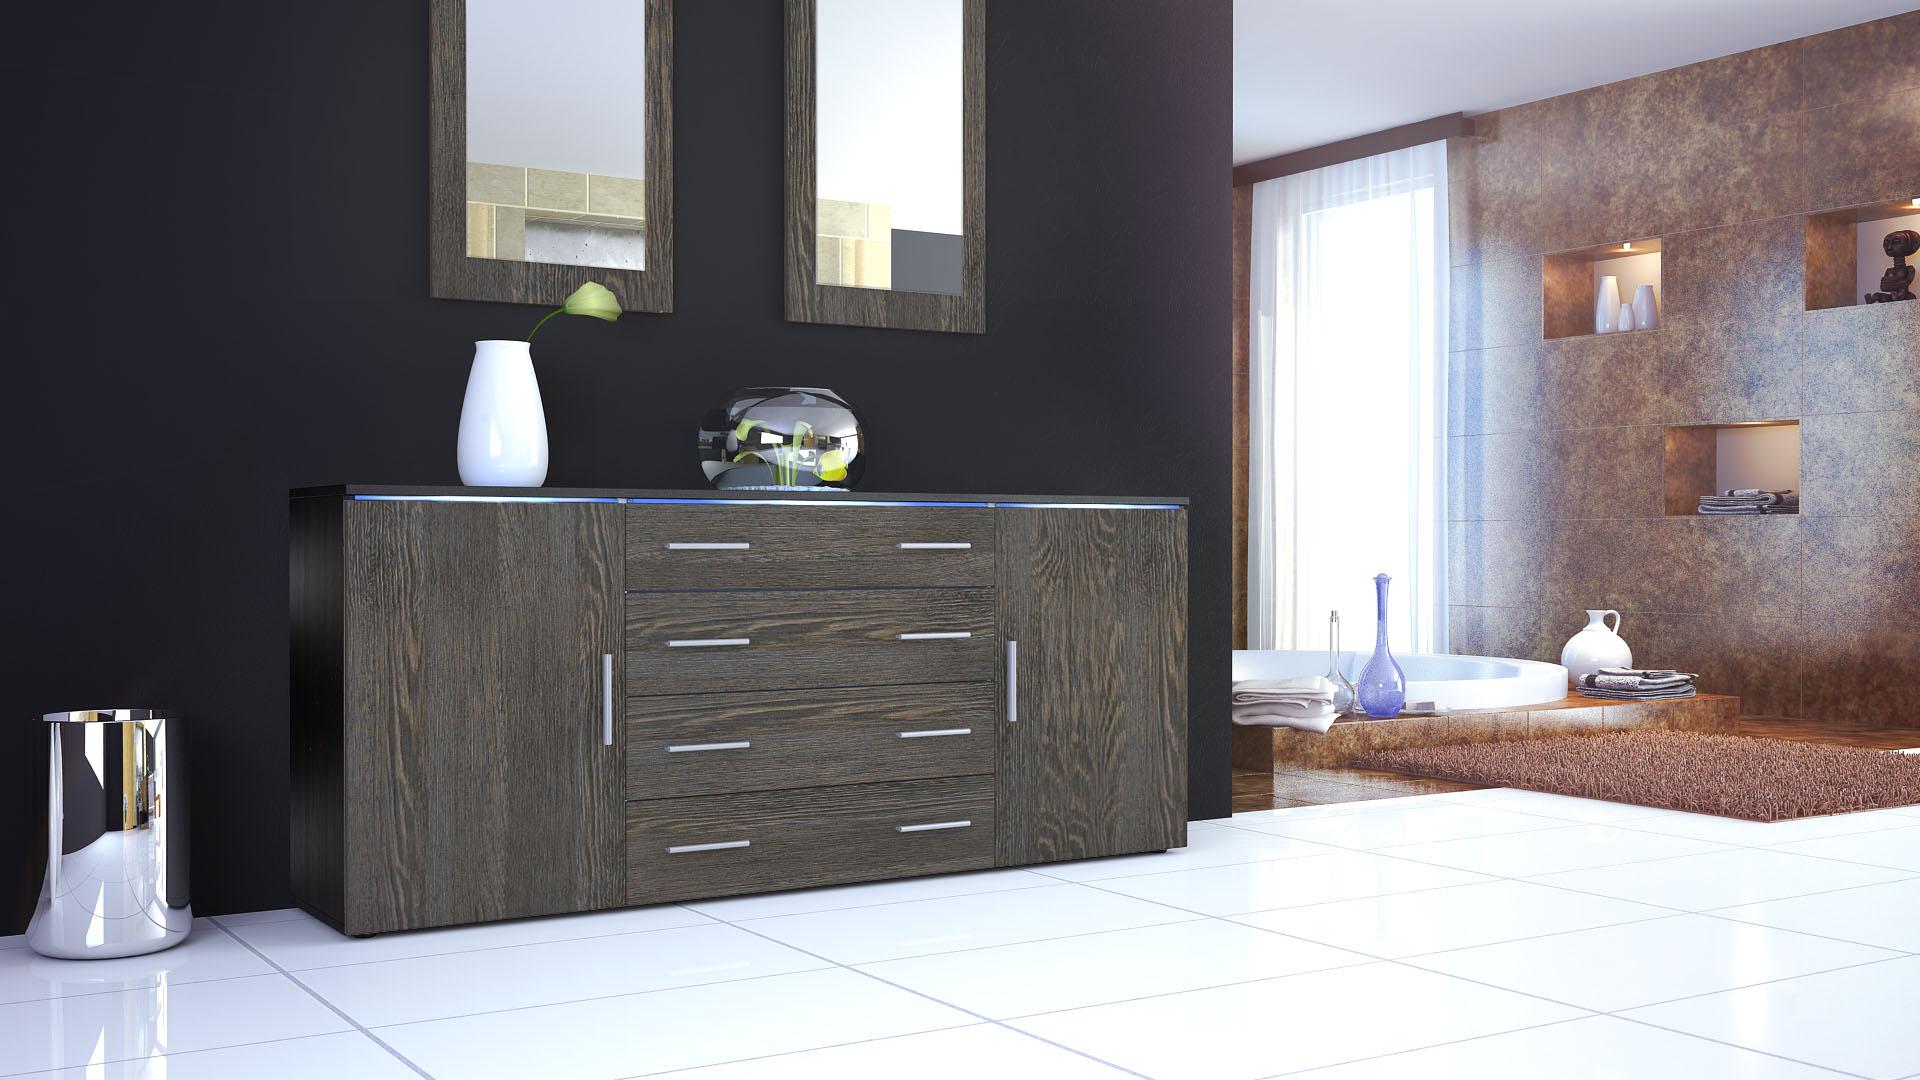 sideboard kommode highboard 170cm tv schrank anrichte faro v2 schwarz hochglanz ebay. Black Bedroom Furniture Sets. Home Design Ideas